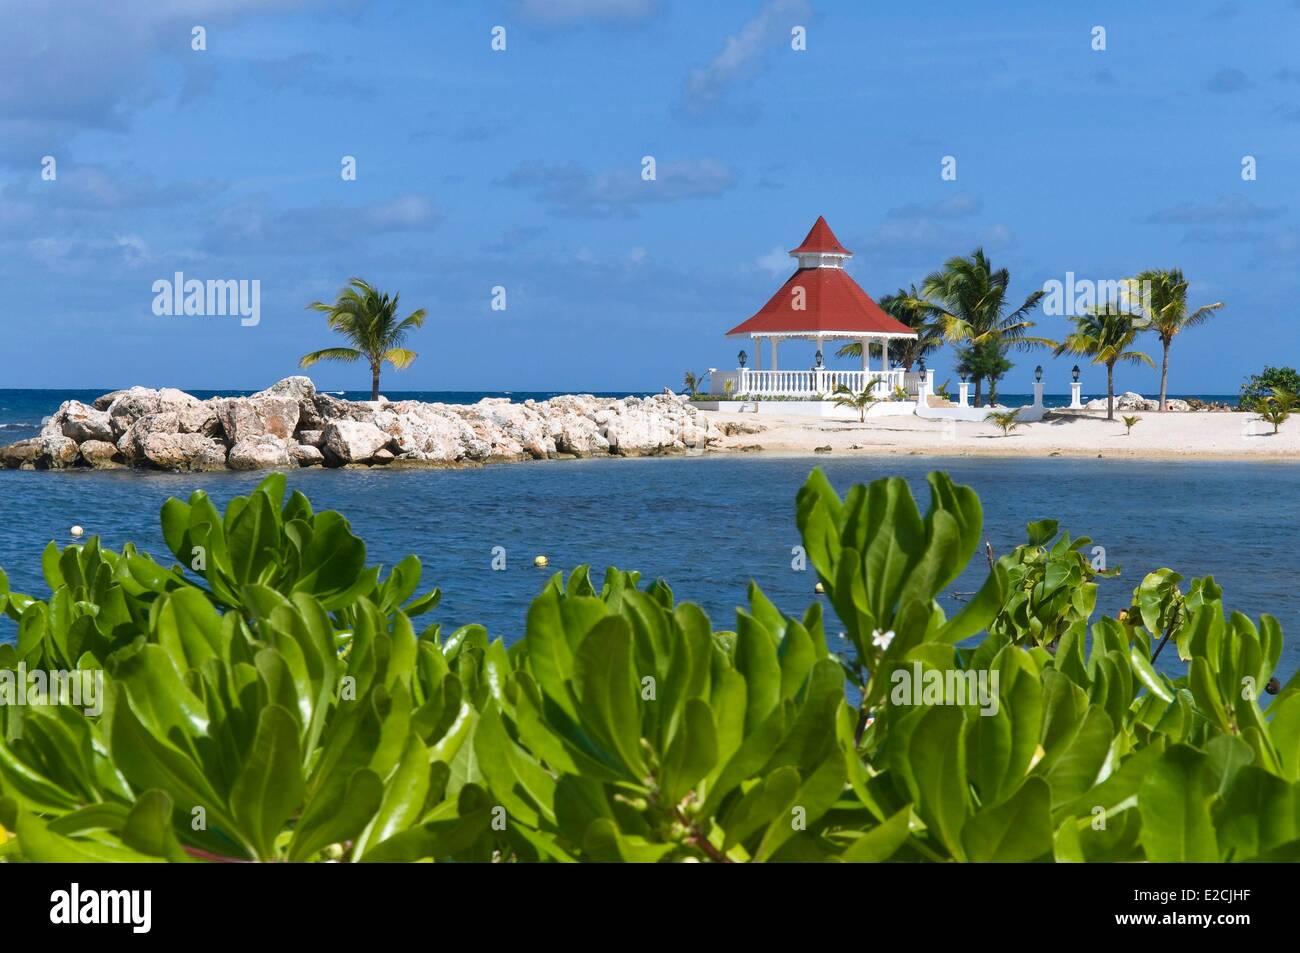 Jamaica, West Indies, parish of St Ann, Ocho Rios, seaside of local resort hotel - Stock Image